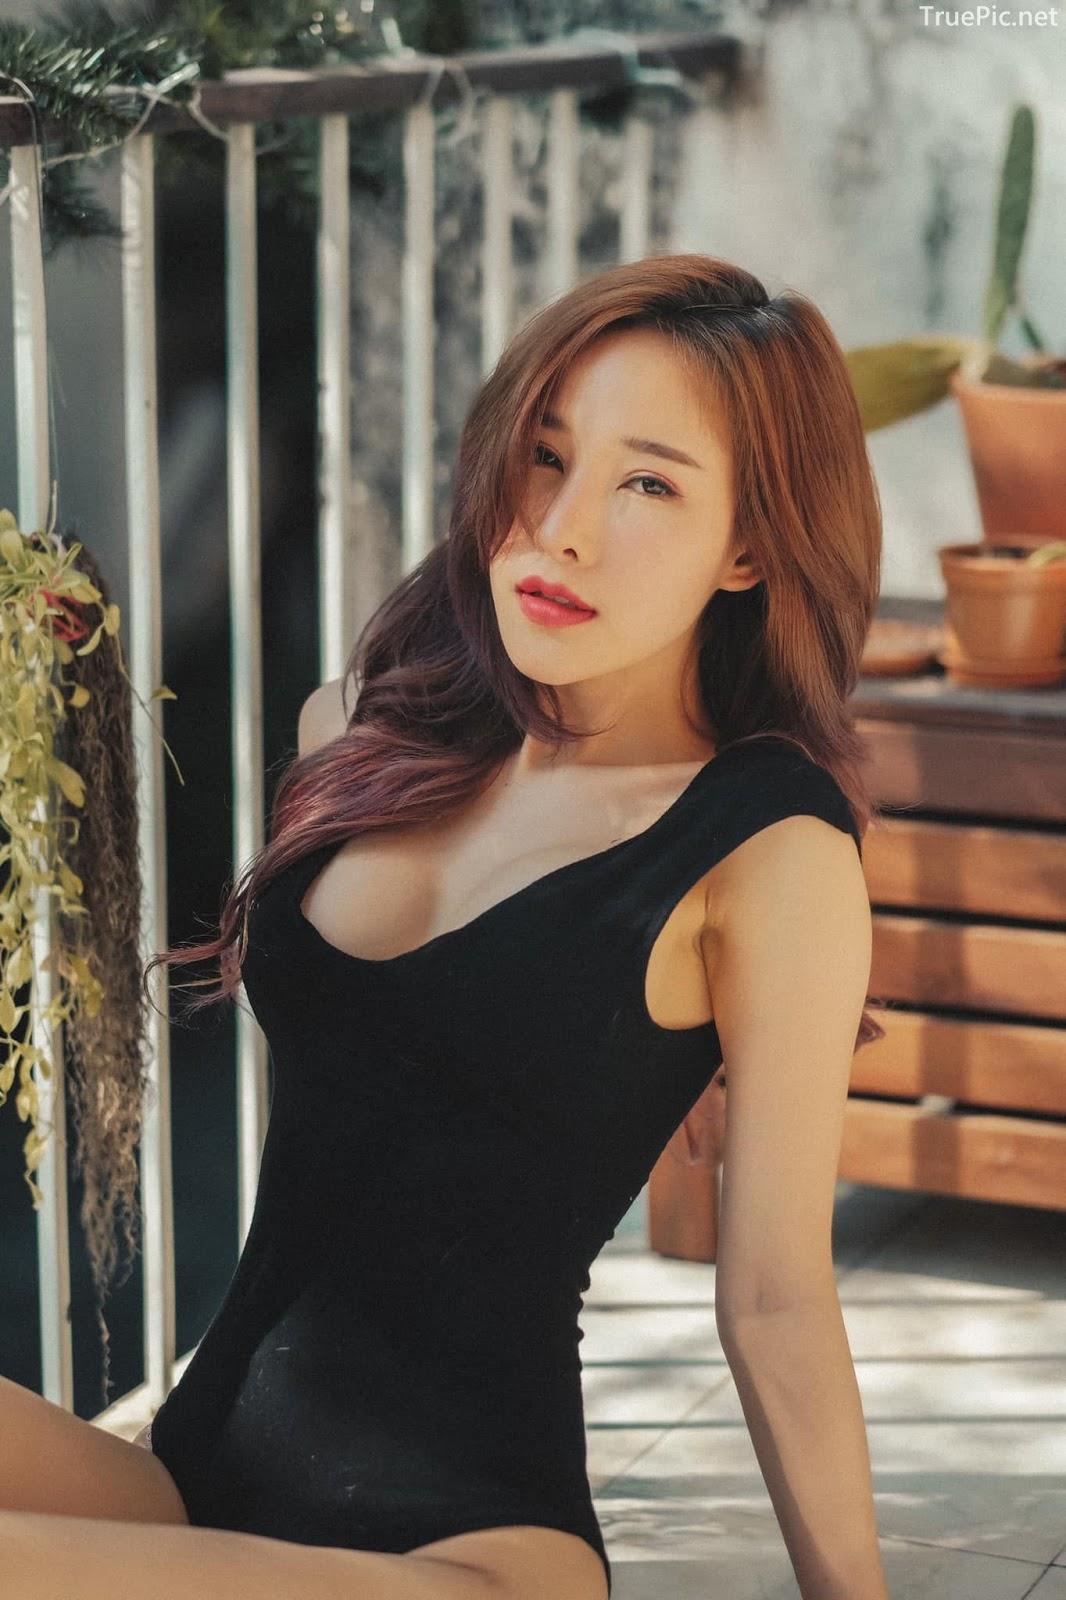 Thailand model - Arys Nam-in (Arysiacara) - Black Rose feeling the sun - Picture 7